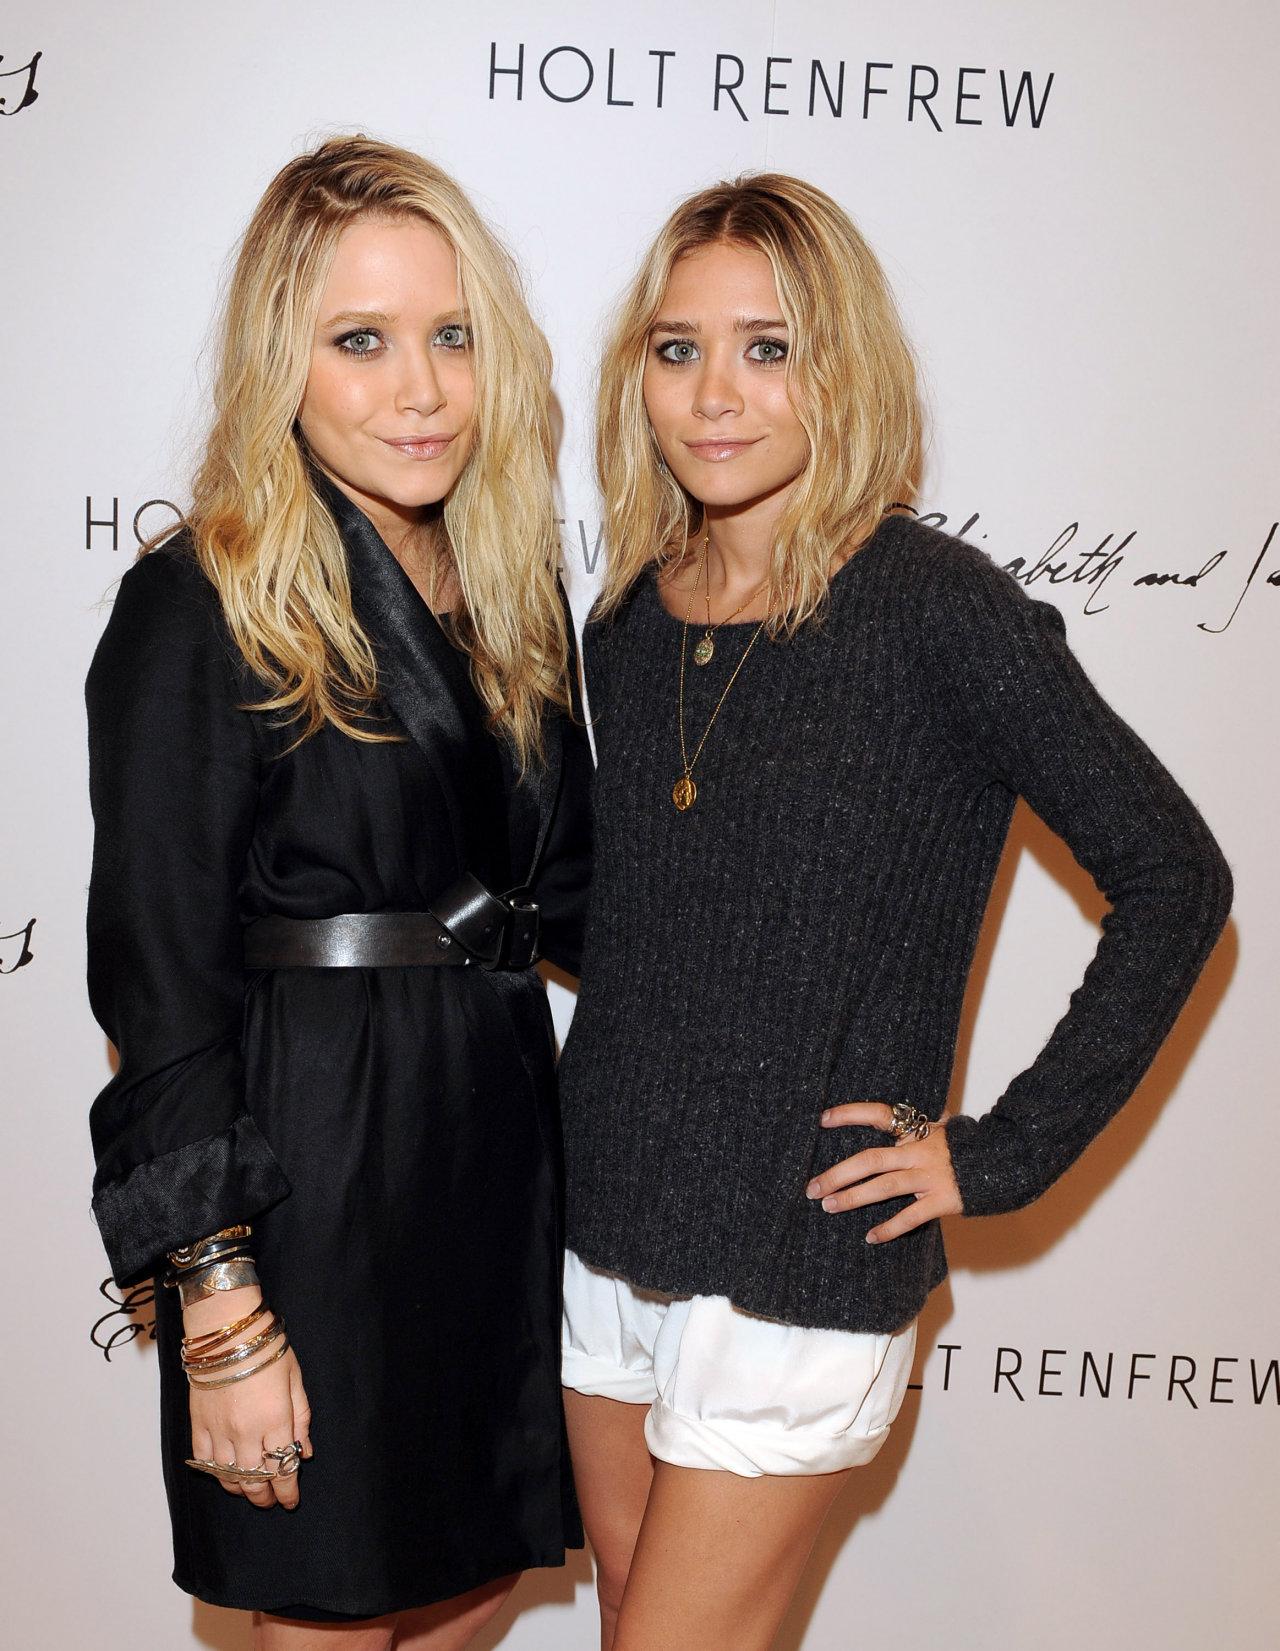 Olsen-Twins-mary-kate-and-ashley-olsen-17173254-1280-1651